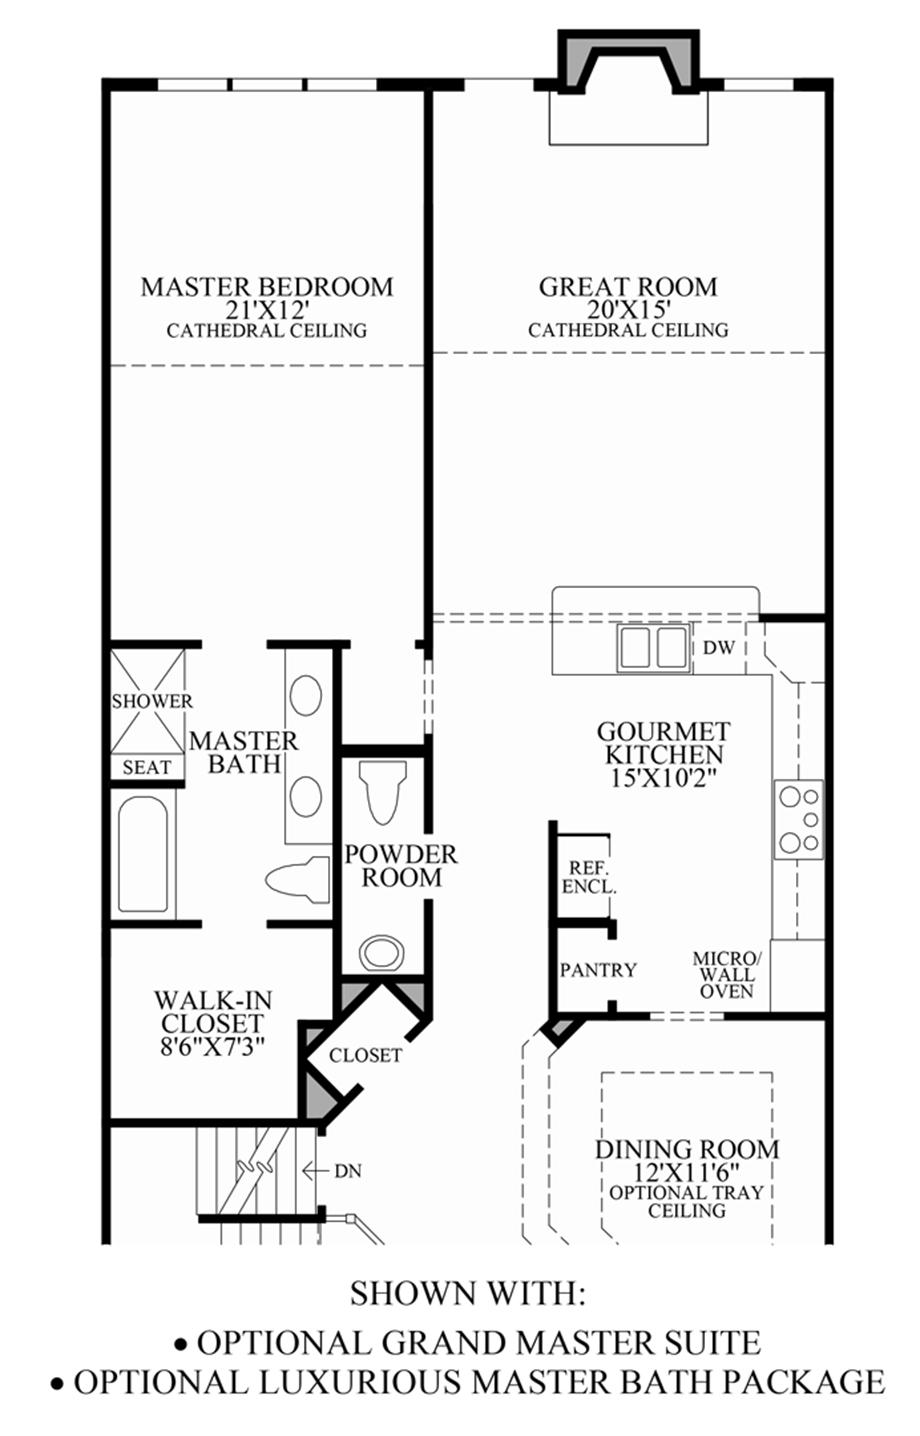 Optional Grand Master Suite/Luxurious Master Bath Package Floor Plan